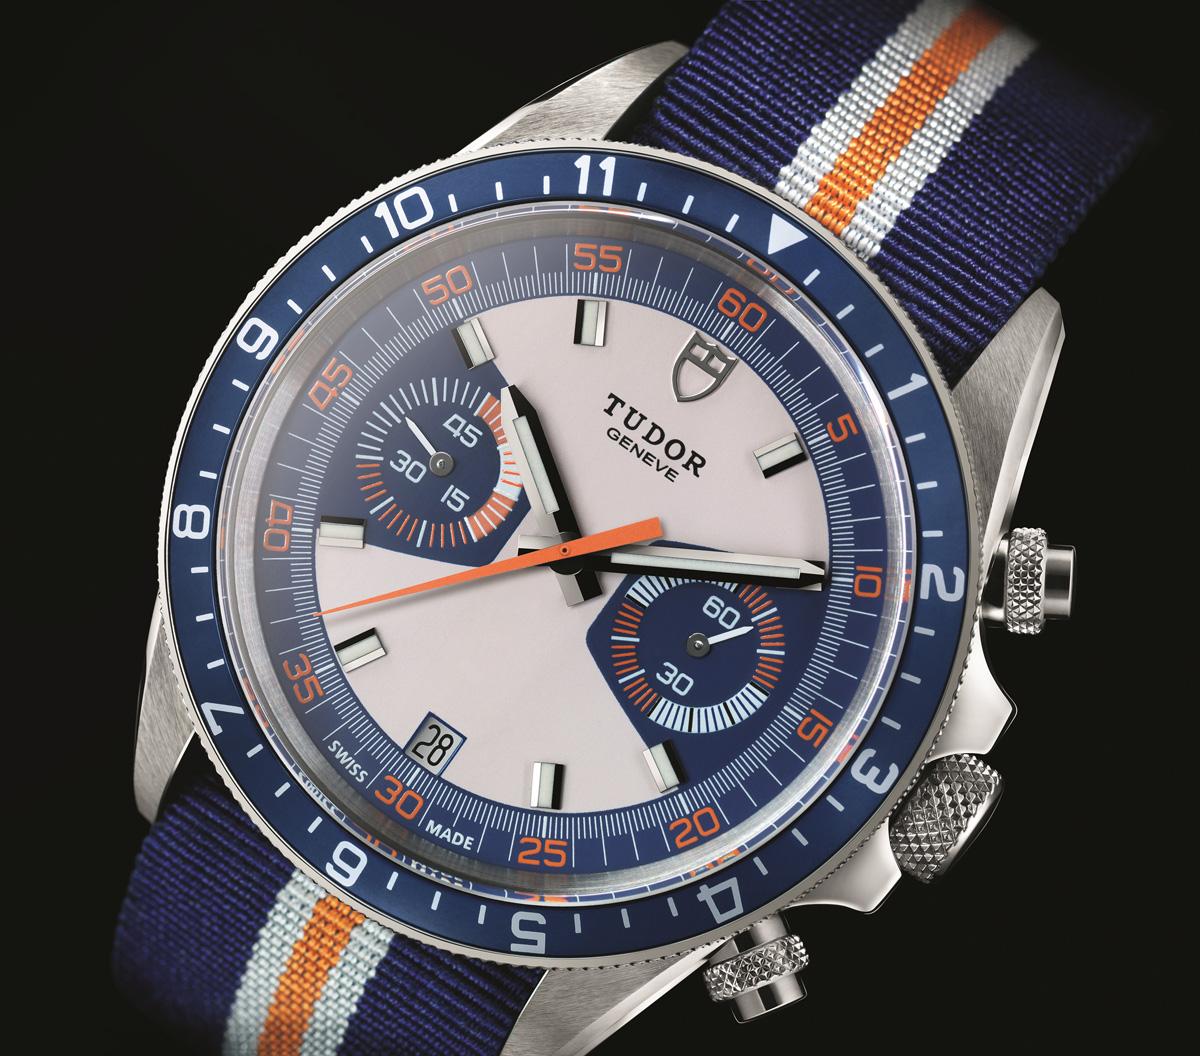 watches by sjx baselworld 2013 tudor heritage chrono